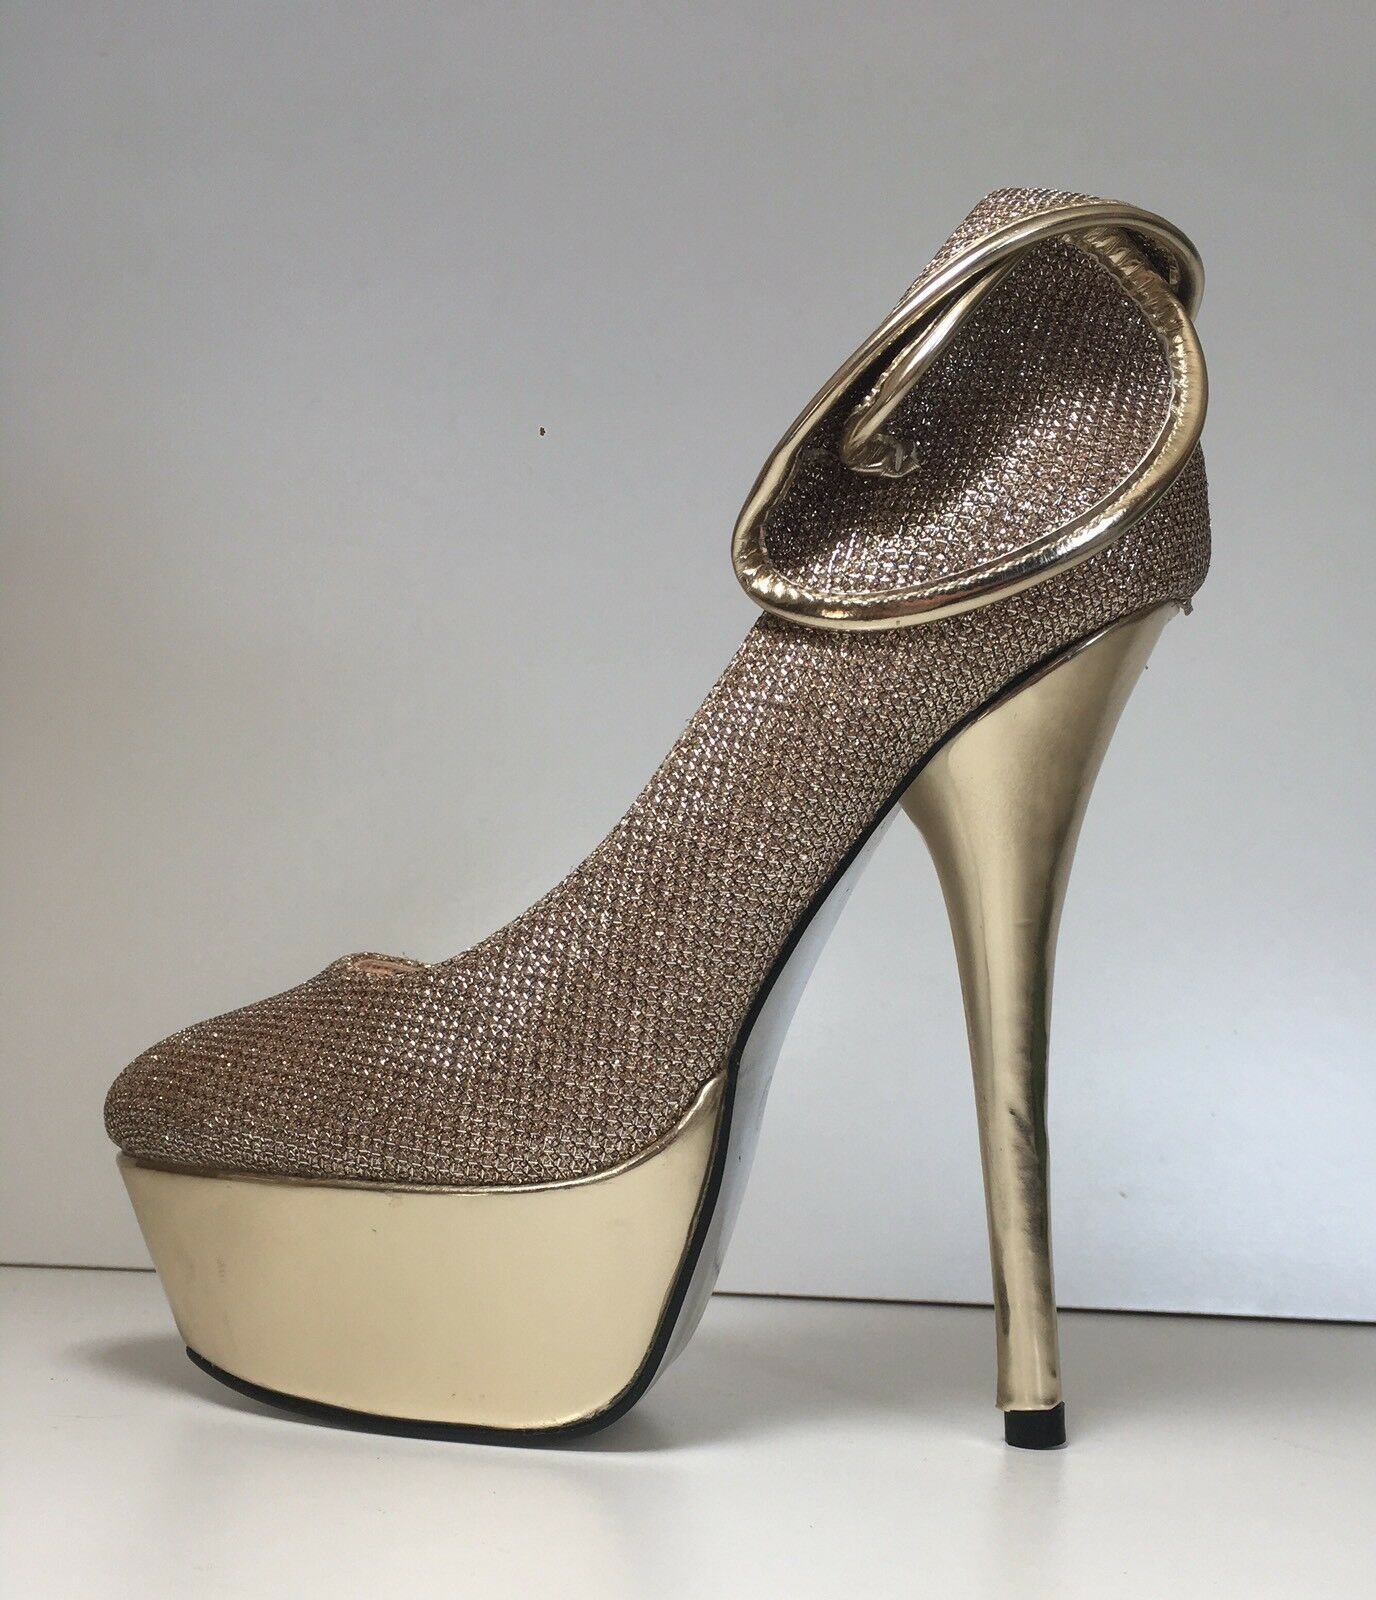 Ladies BNIB Gold Platform Stiletto High Heel Shoes Pumps Pole Essex Sz 3.5, 36